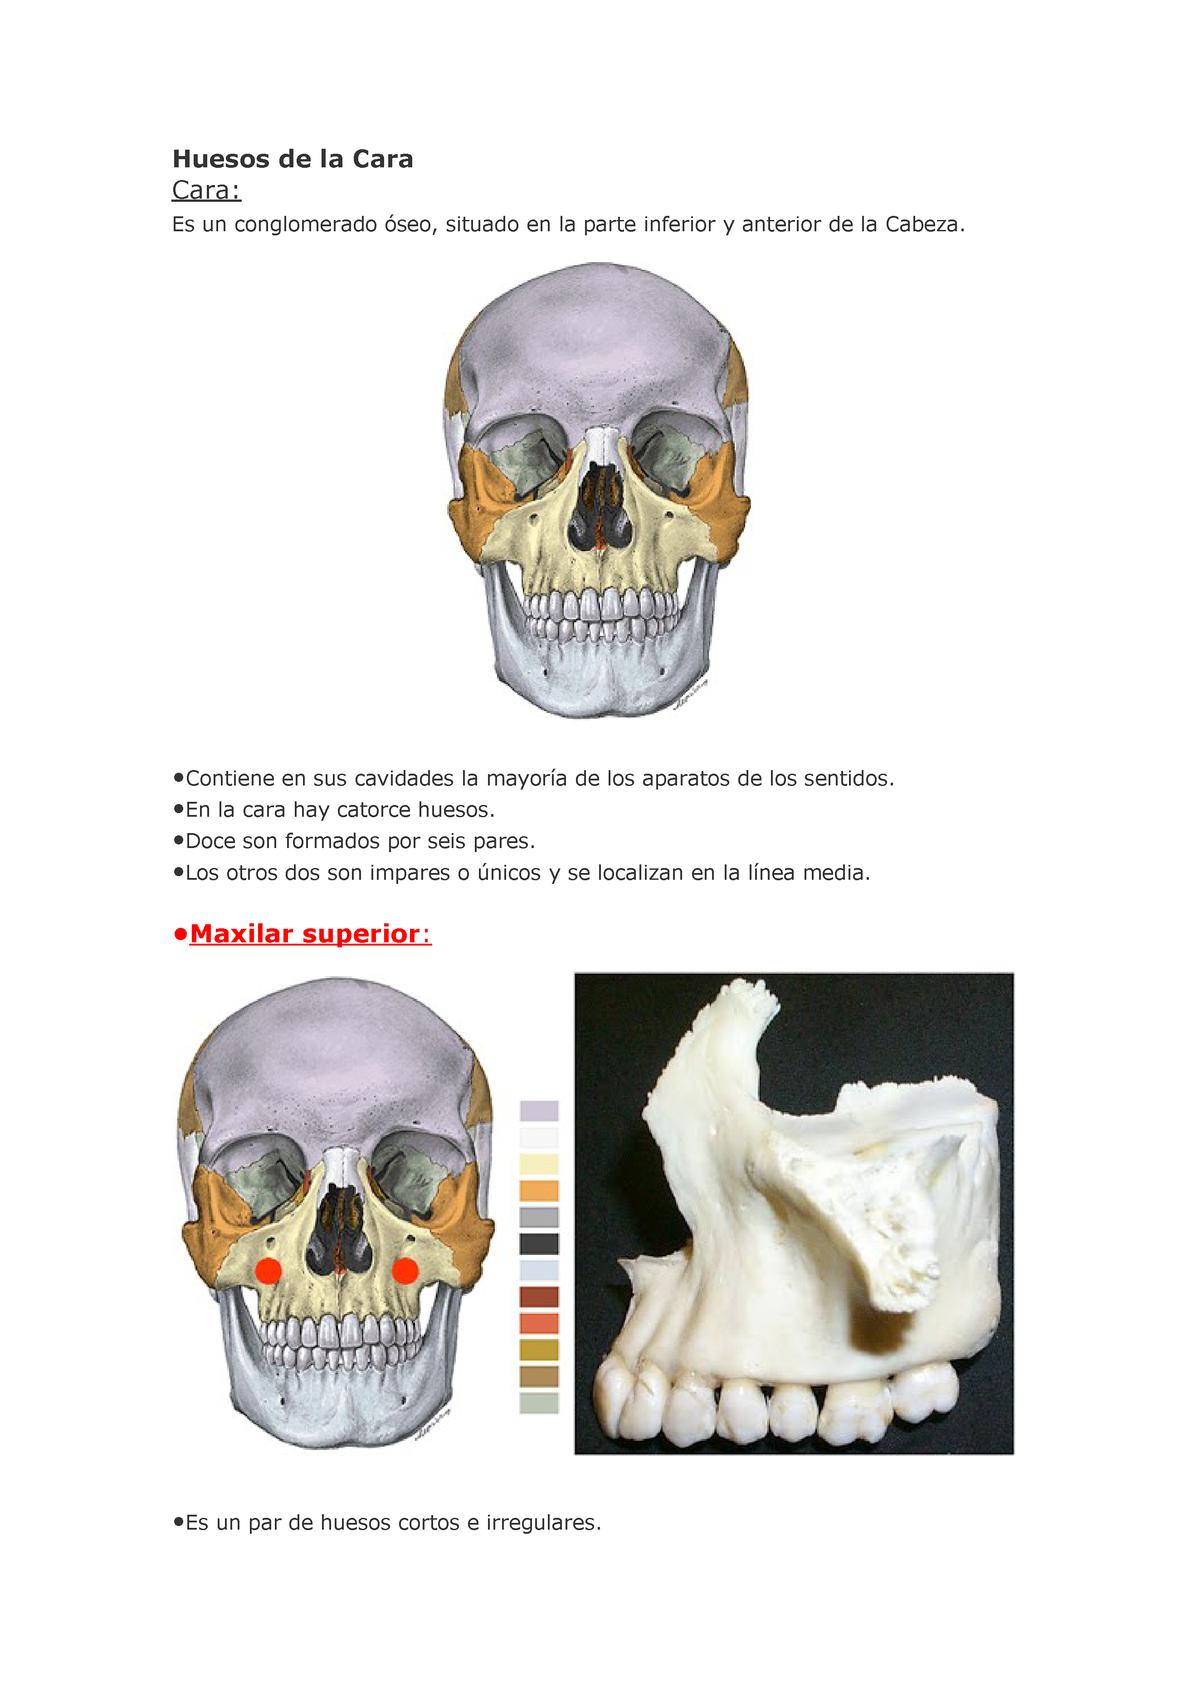 agenesia del hueso frontal